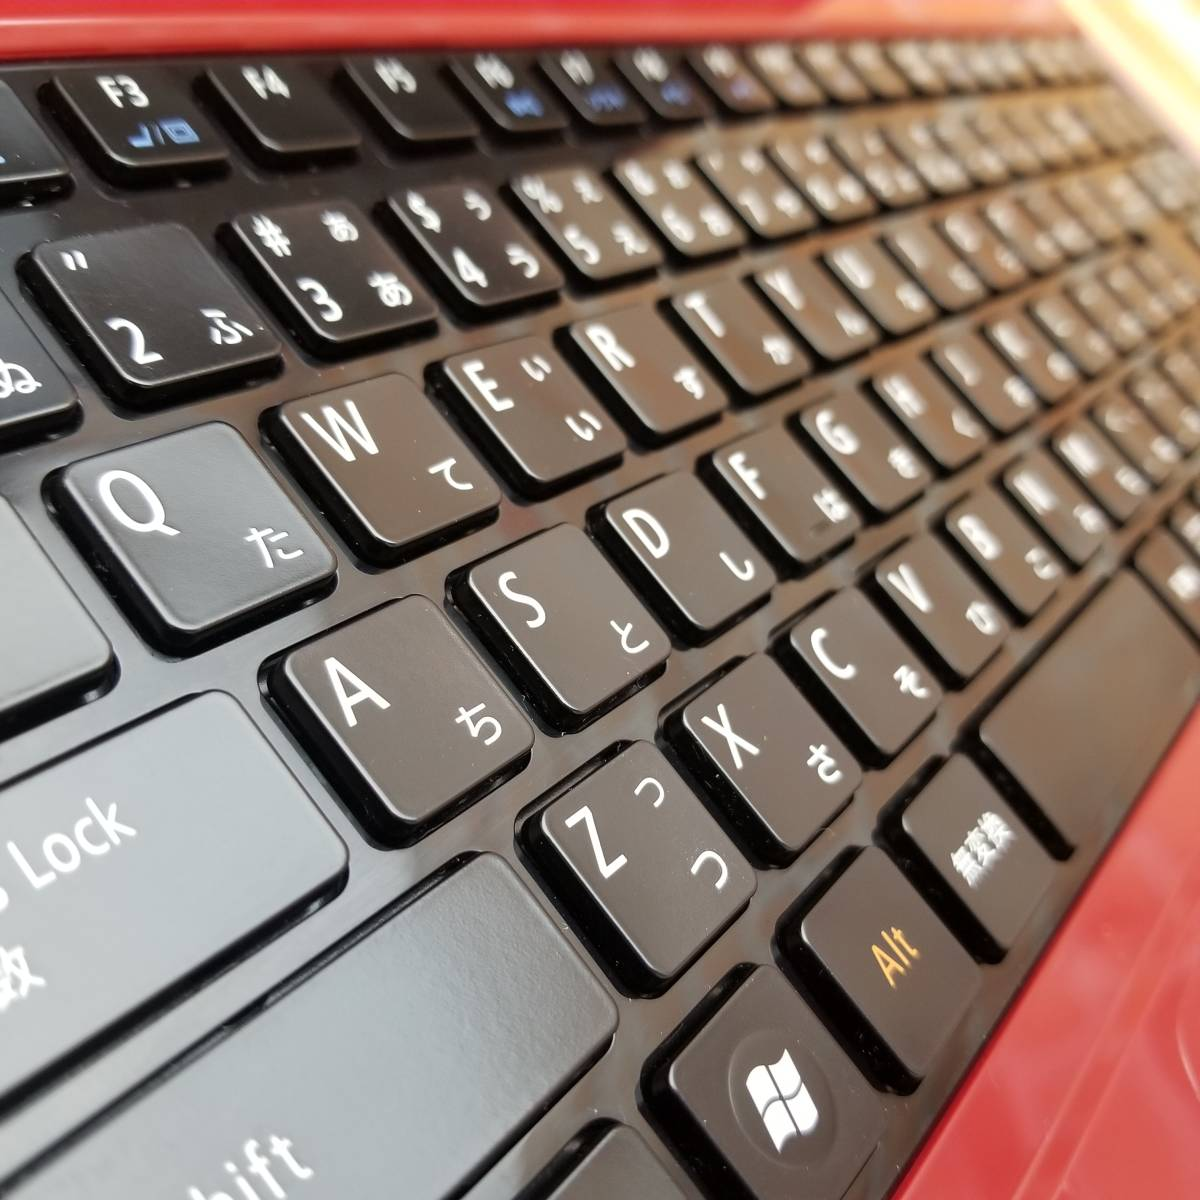 ★美品★国内正規新品SSD500GB/メモリ4GB/無線 Wi-Fi/Win10/最新Office/高性能Pentium P6200搭載/LaVie S LS150/ES6R(C7744)_★キーボードも綺麗に清掃済です★